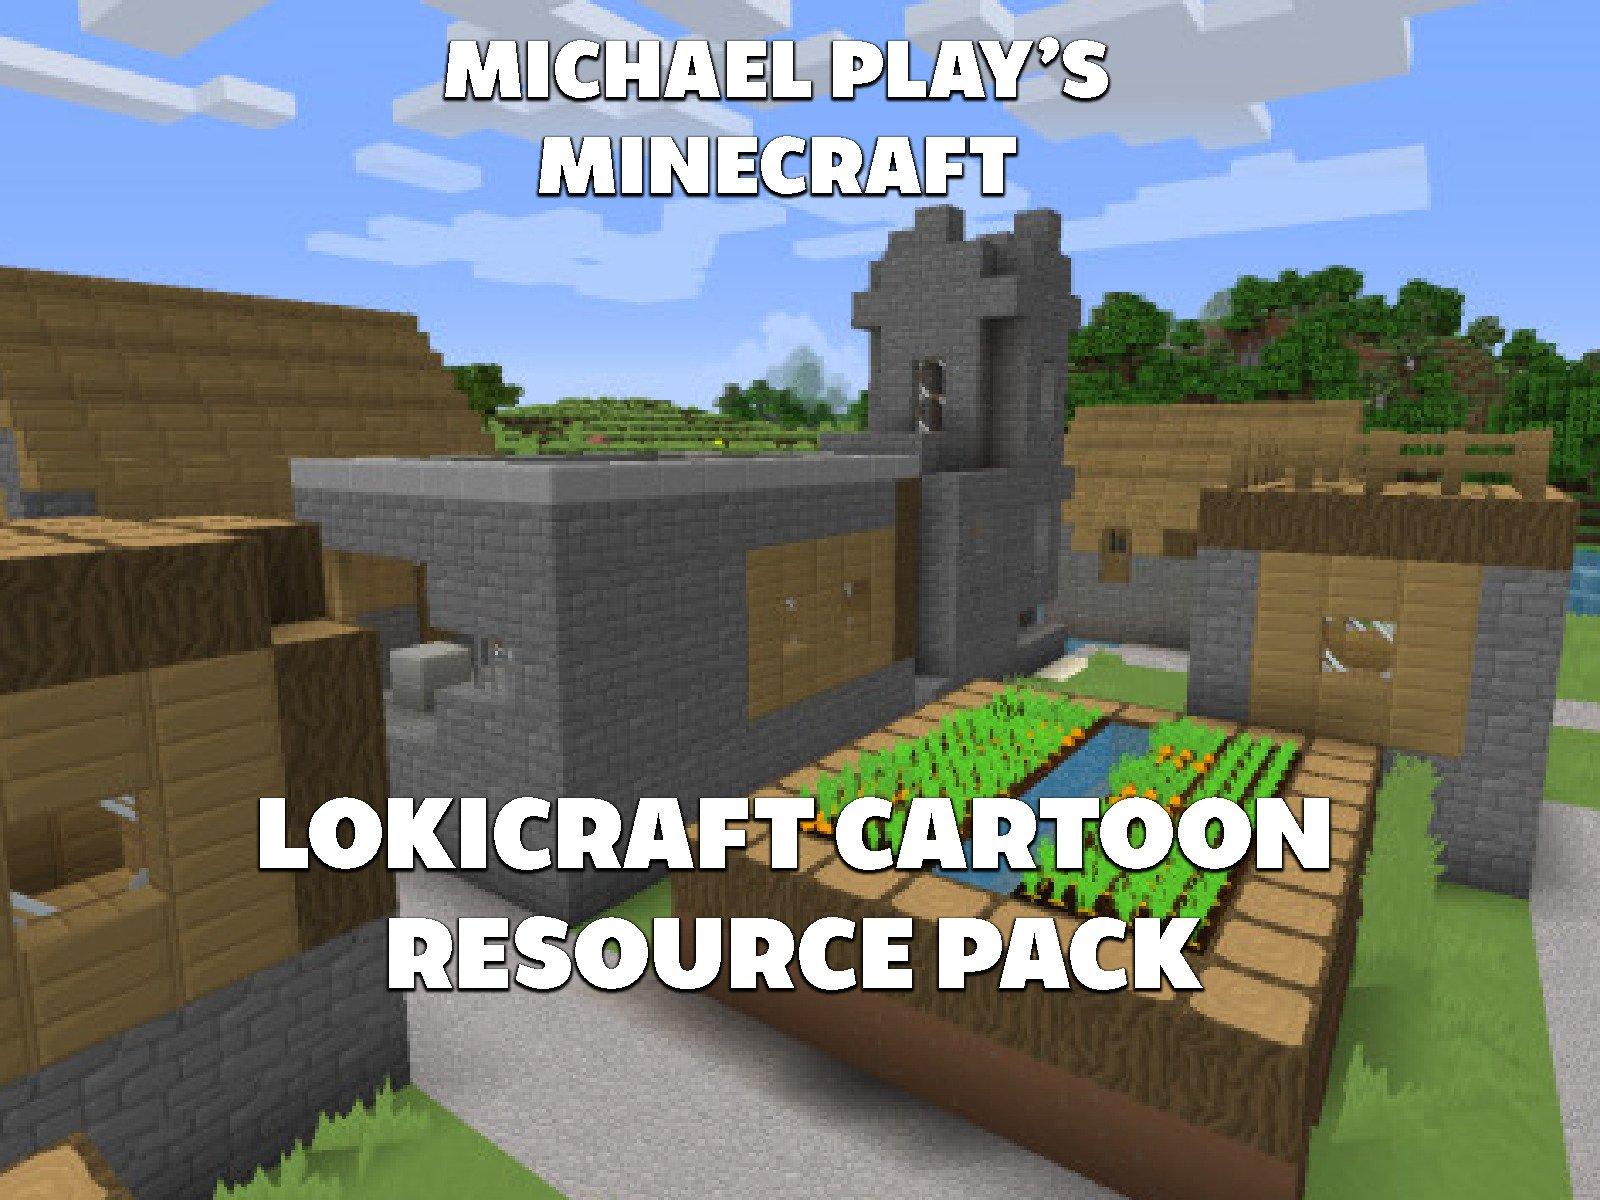 Clip: Michael Play's Minecraft Lokicraft Cartoon Resource Pack